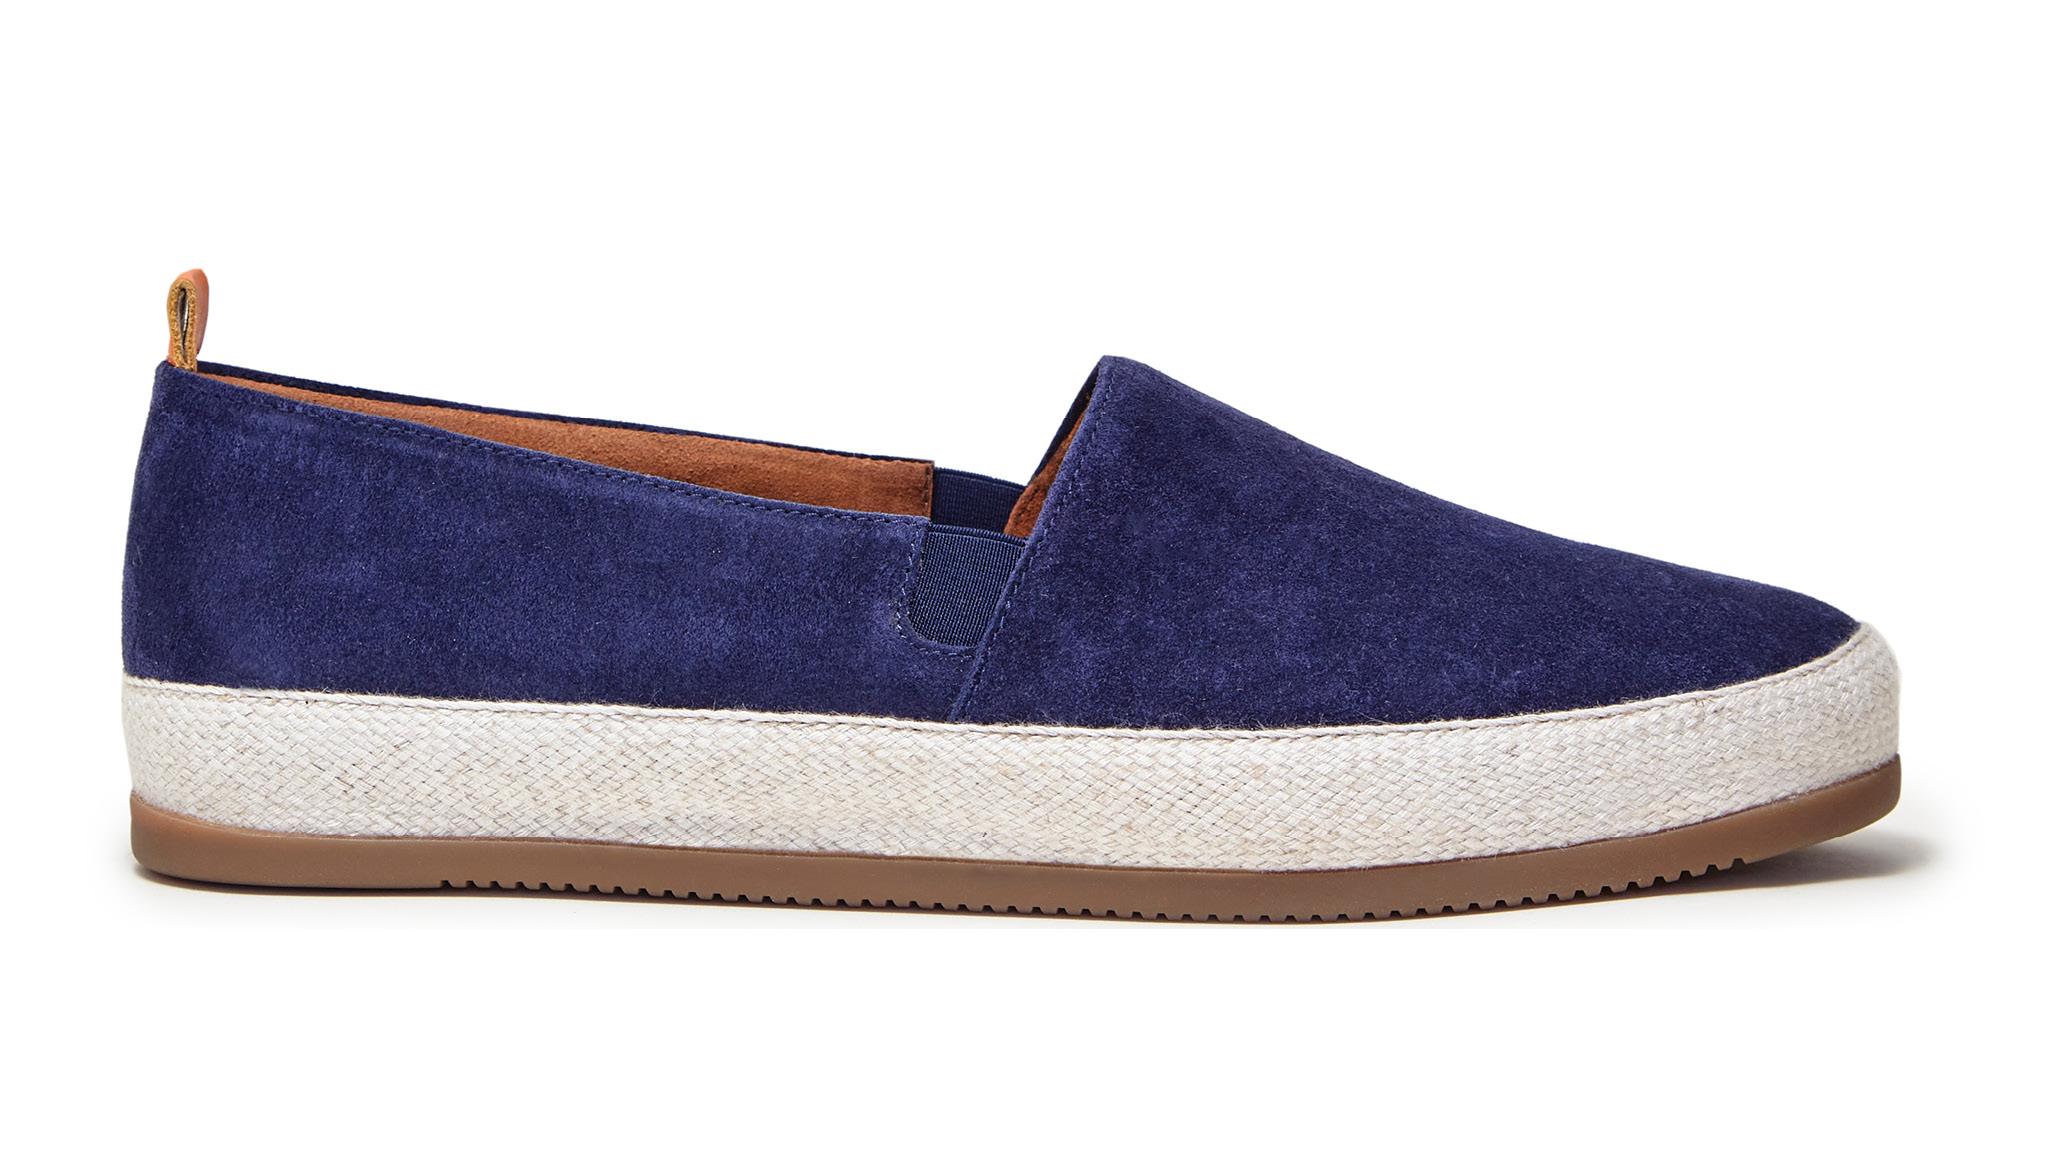 Navy Espadrilles for Men | MULO shoes